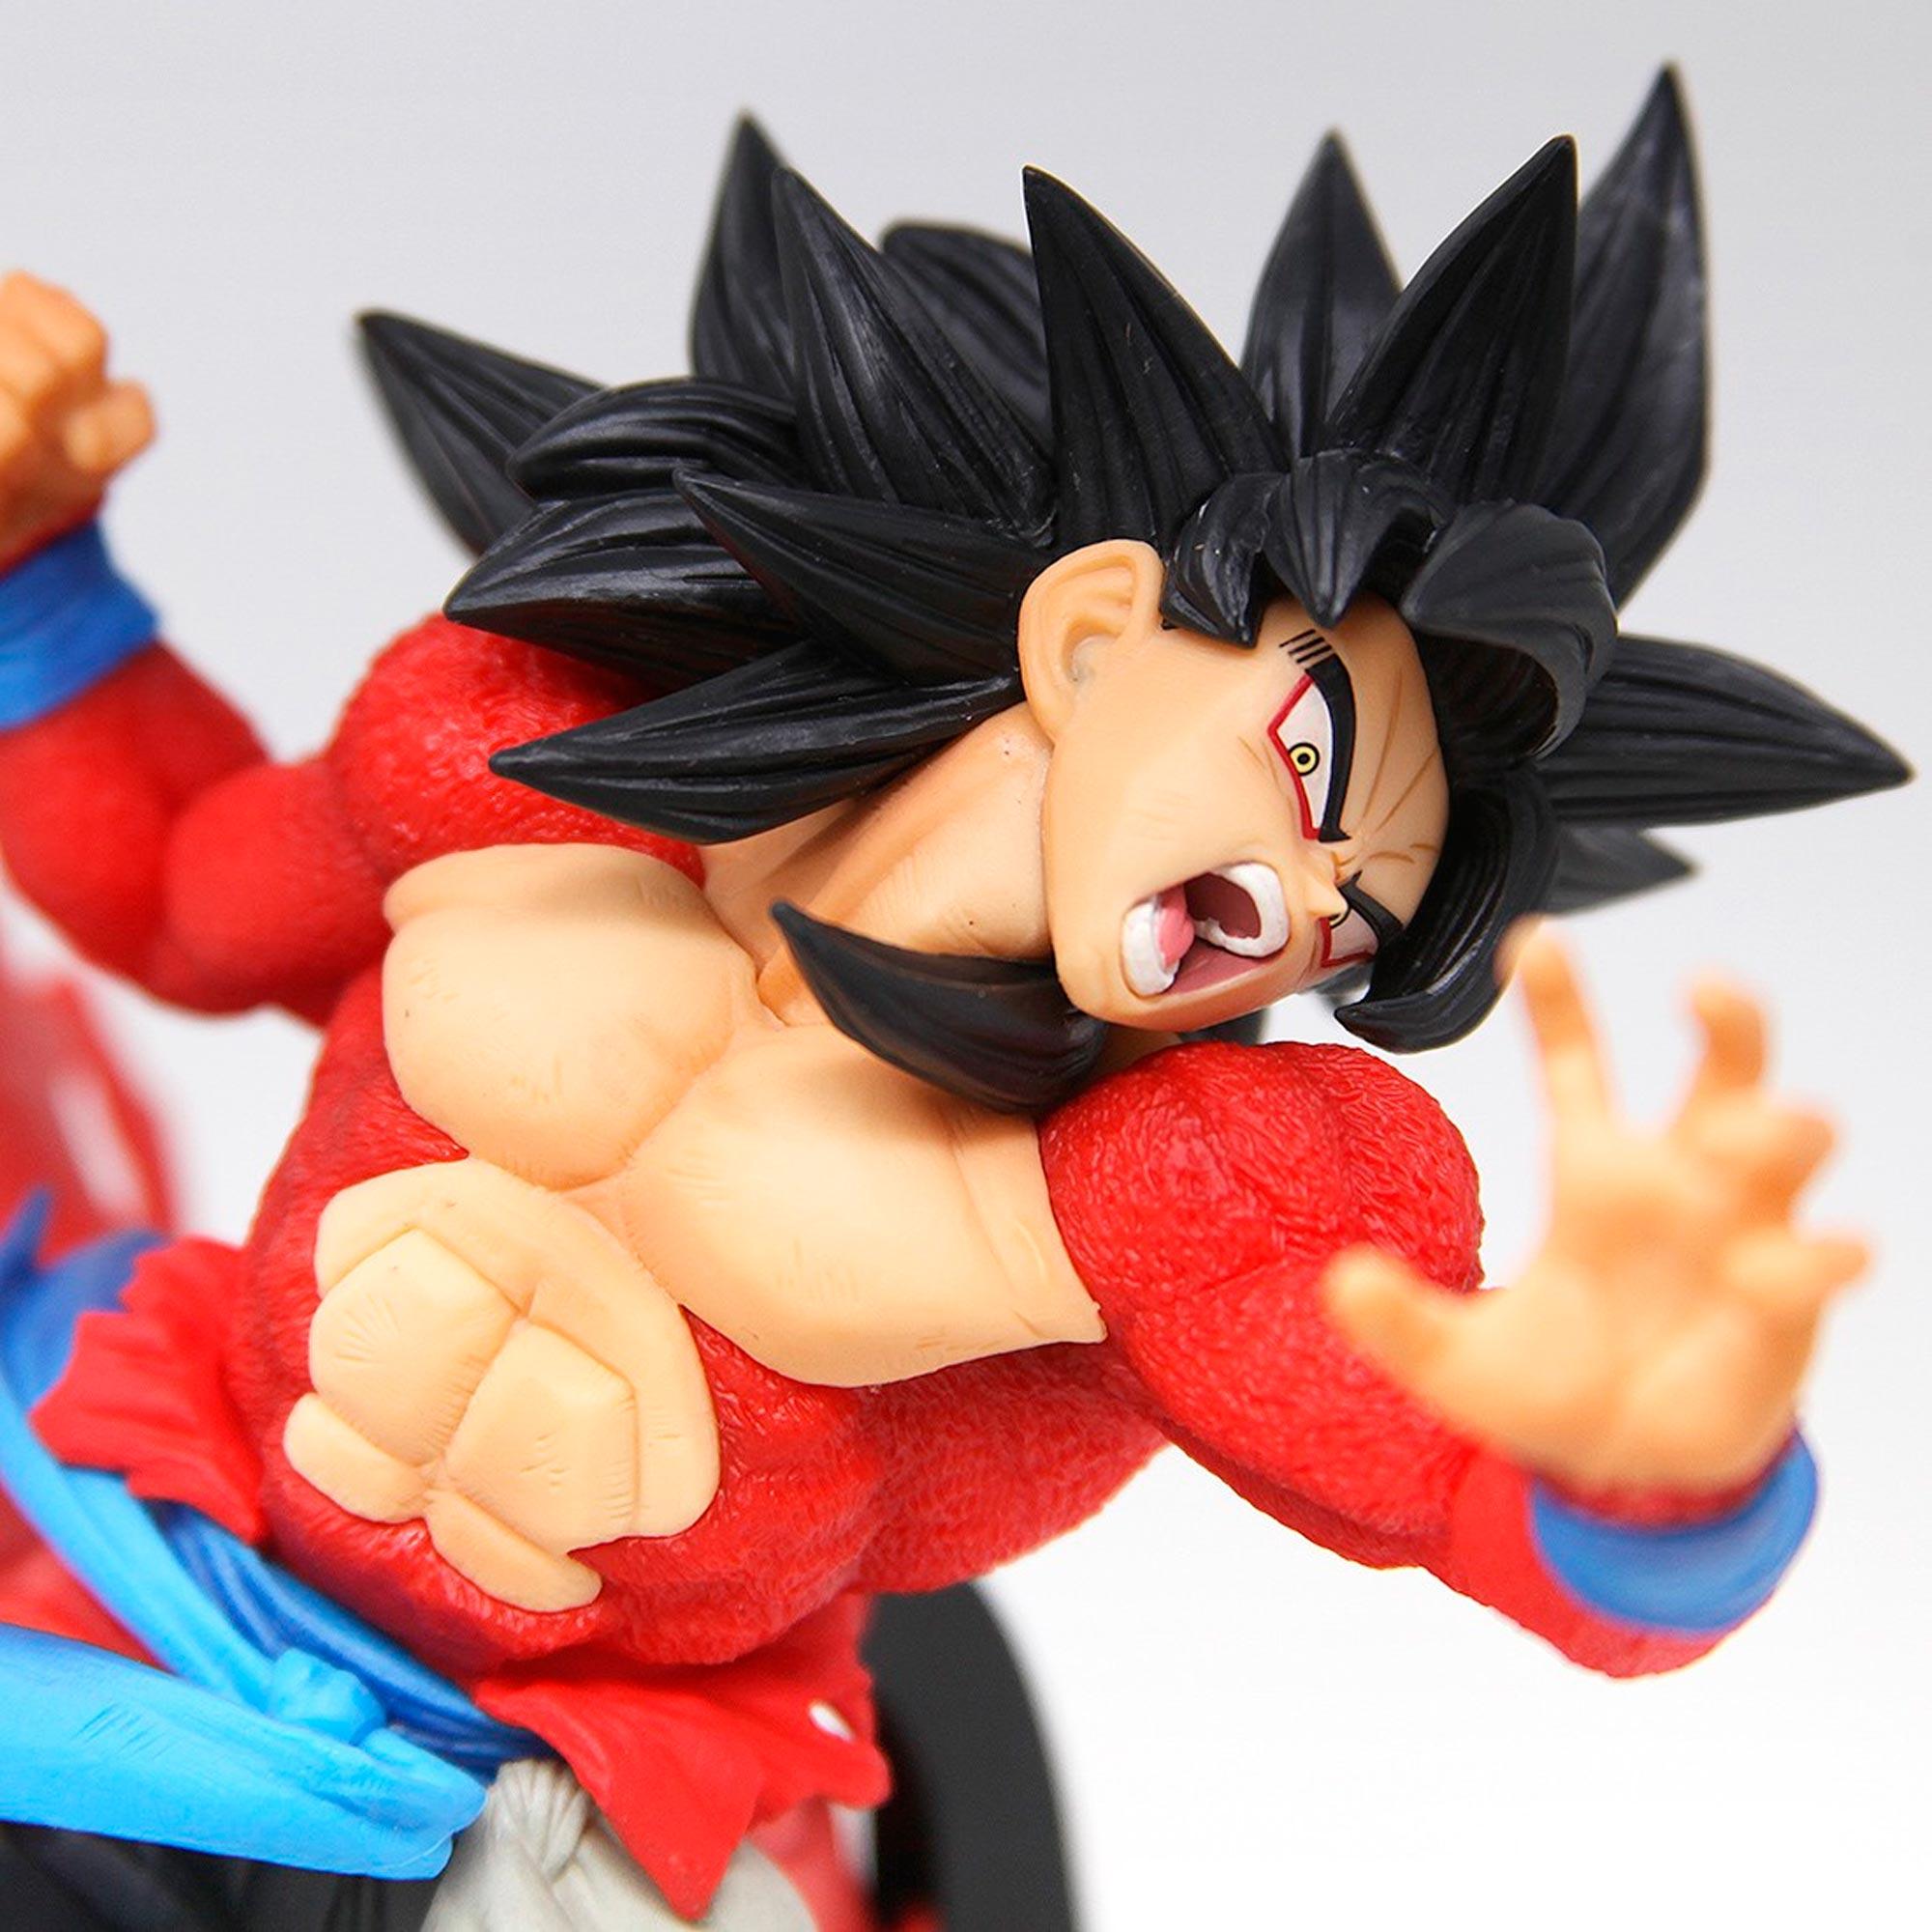 Banpresto Super Dragon Ball Heroes 9th Anniversary Xeno Son Goku